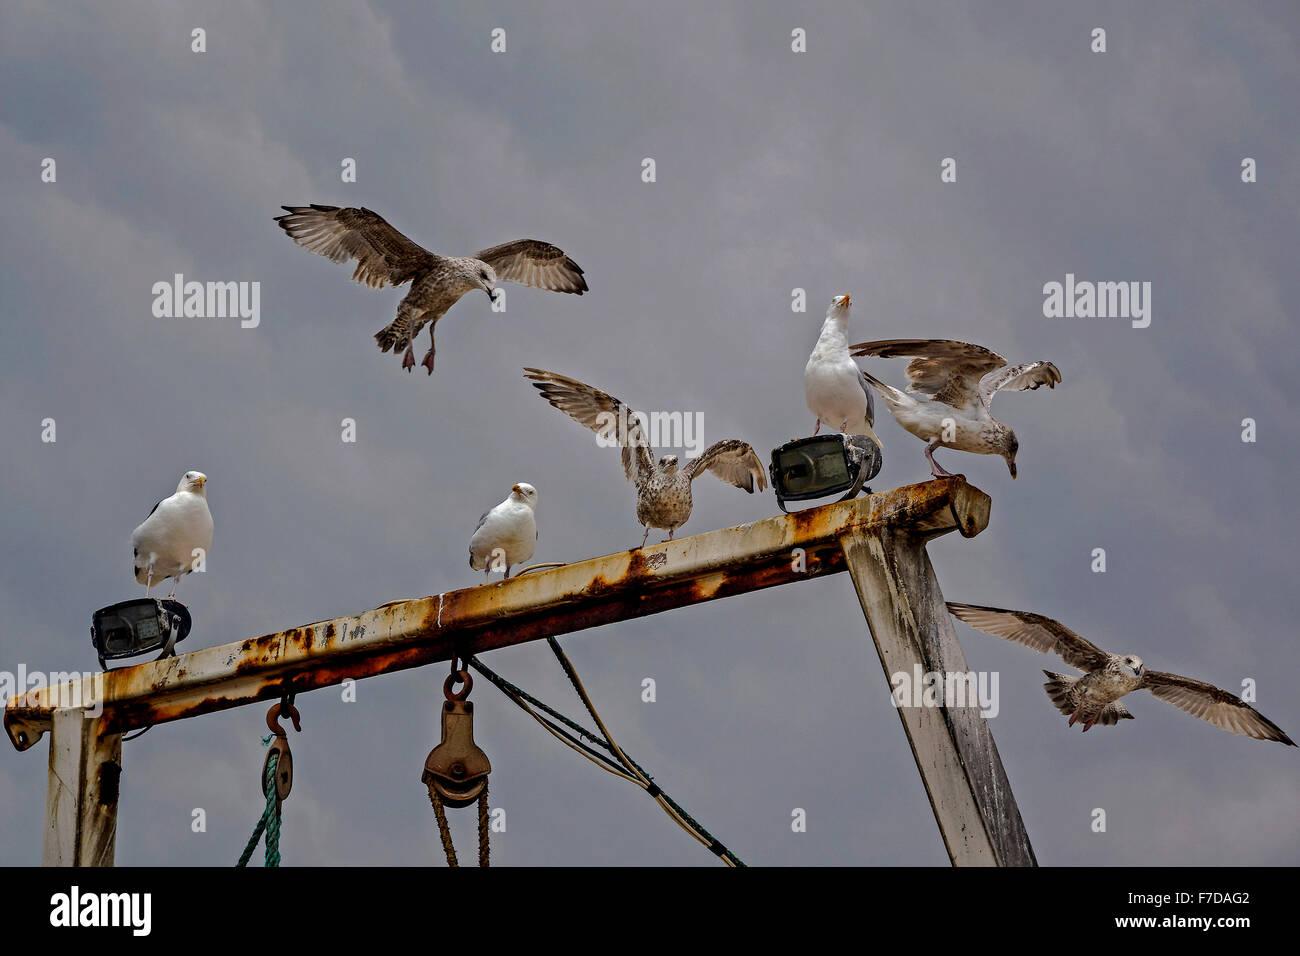 Herring Gulls ( Larus argentatus) Perched on a Gantry Hastings UK - Stock Image